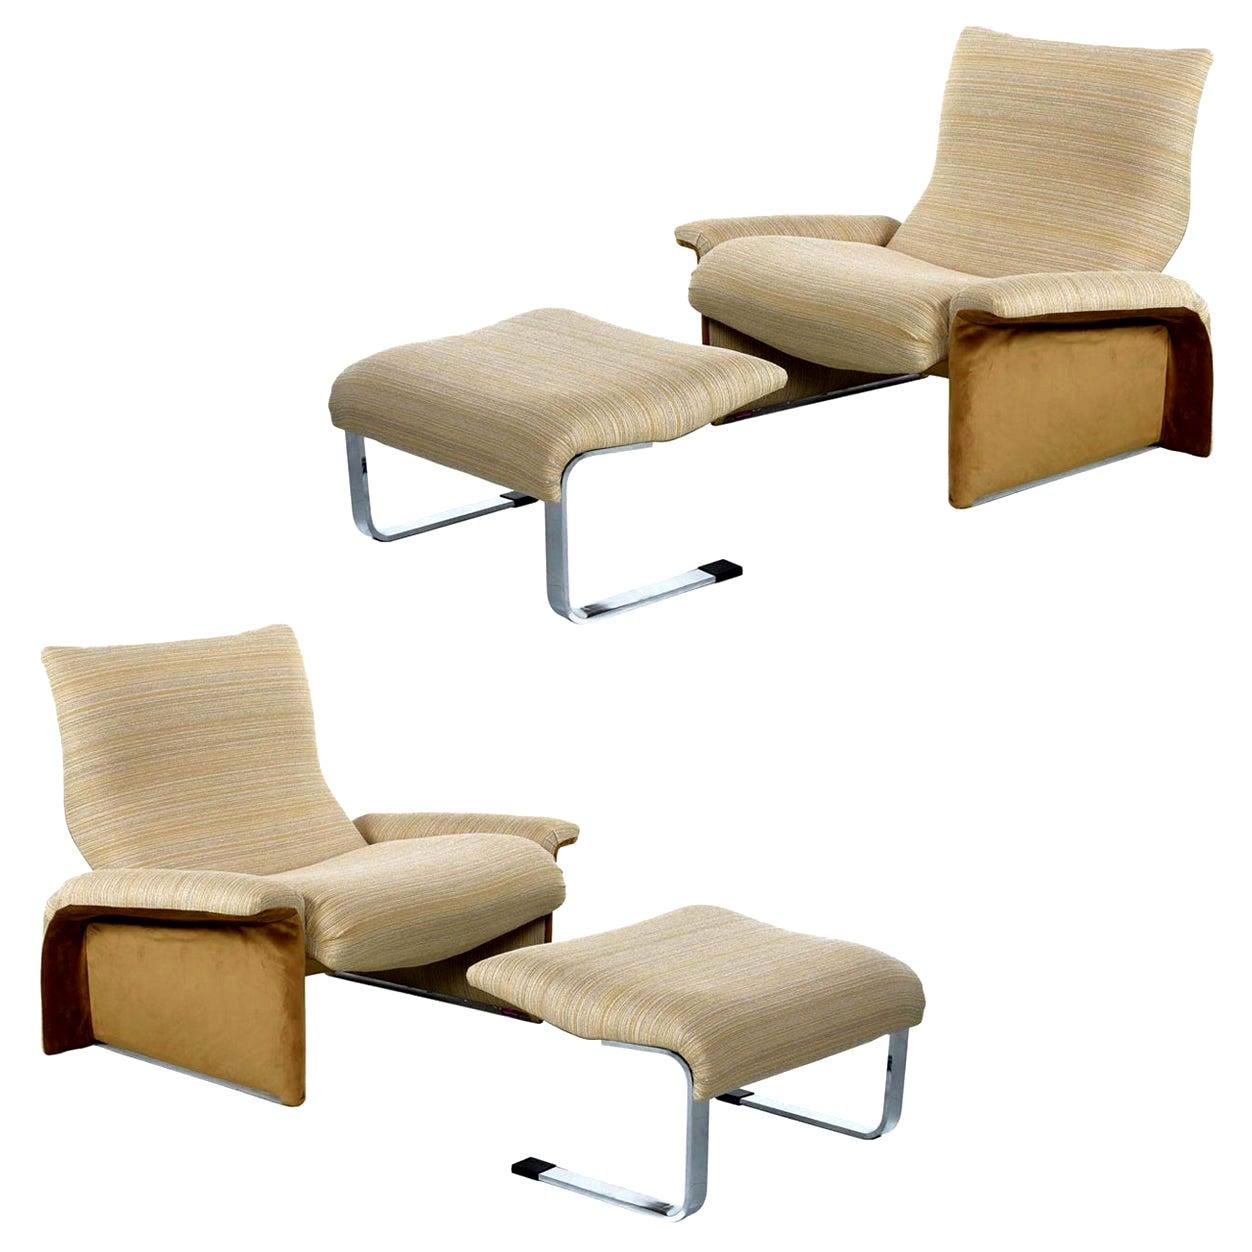 Saporiti Italia Chrome Lounge Chairs and Ottomans by Giovanni Offredi